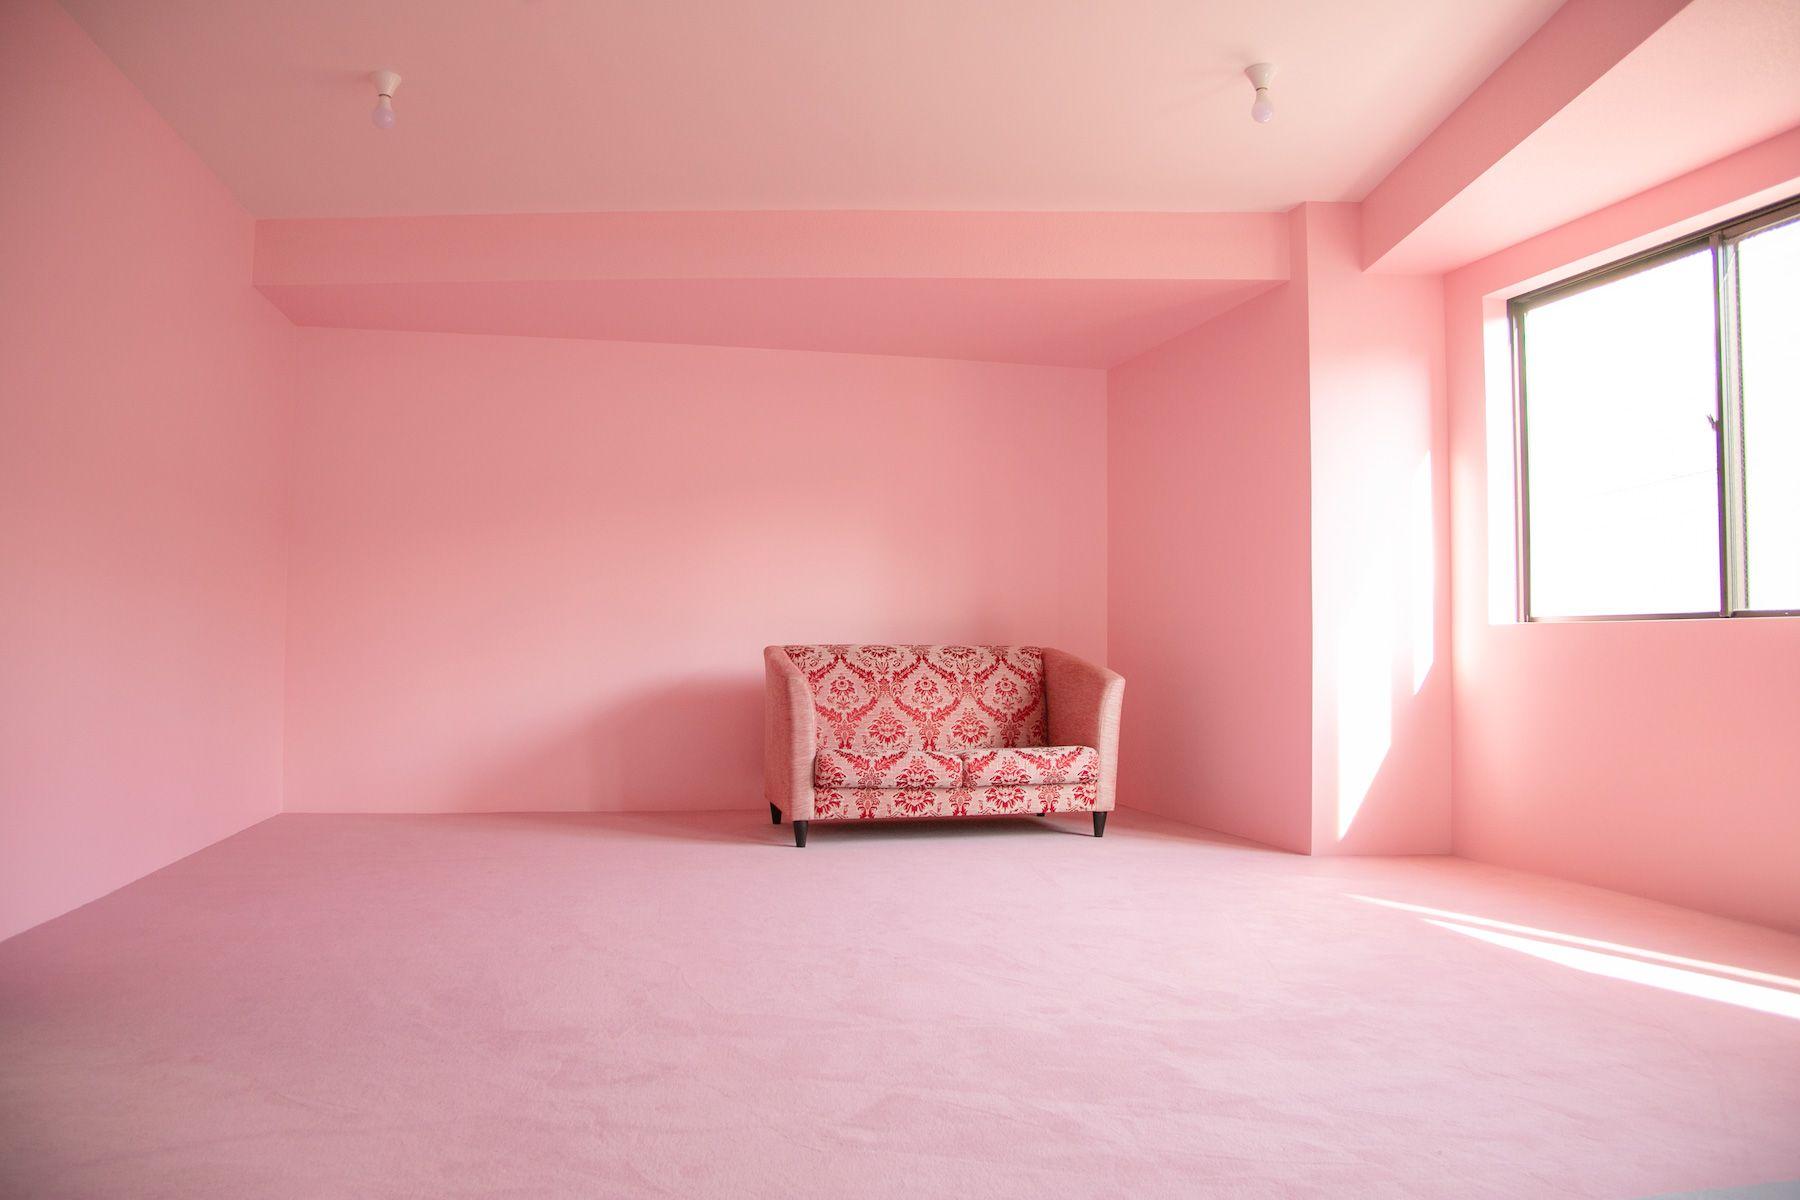 PANSY STUDIO(パンジースタジオ)ピンクのスペース